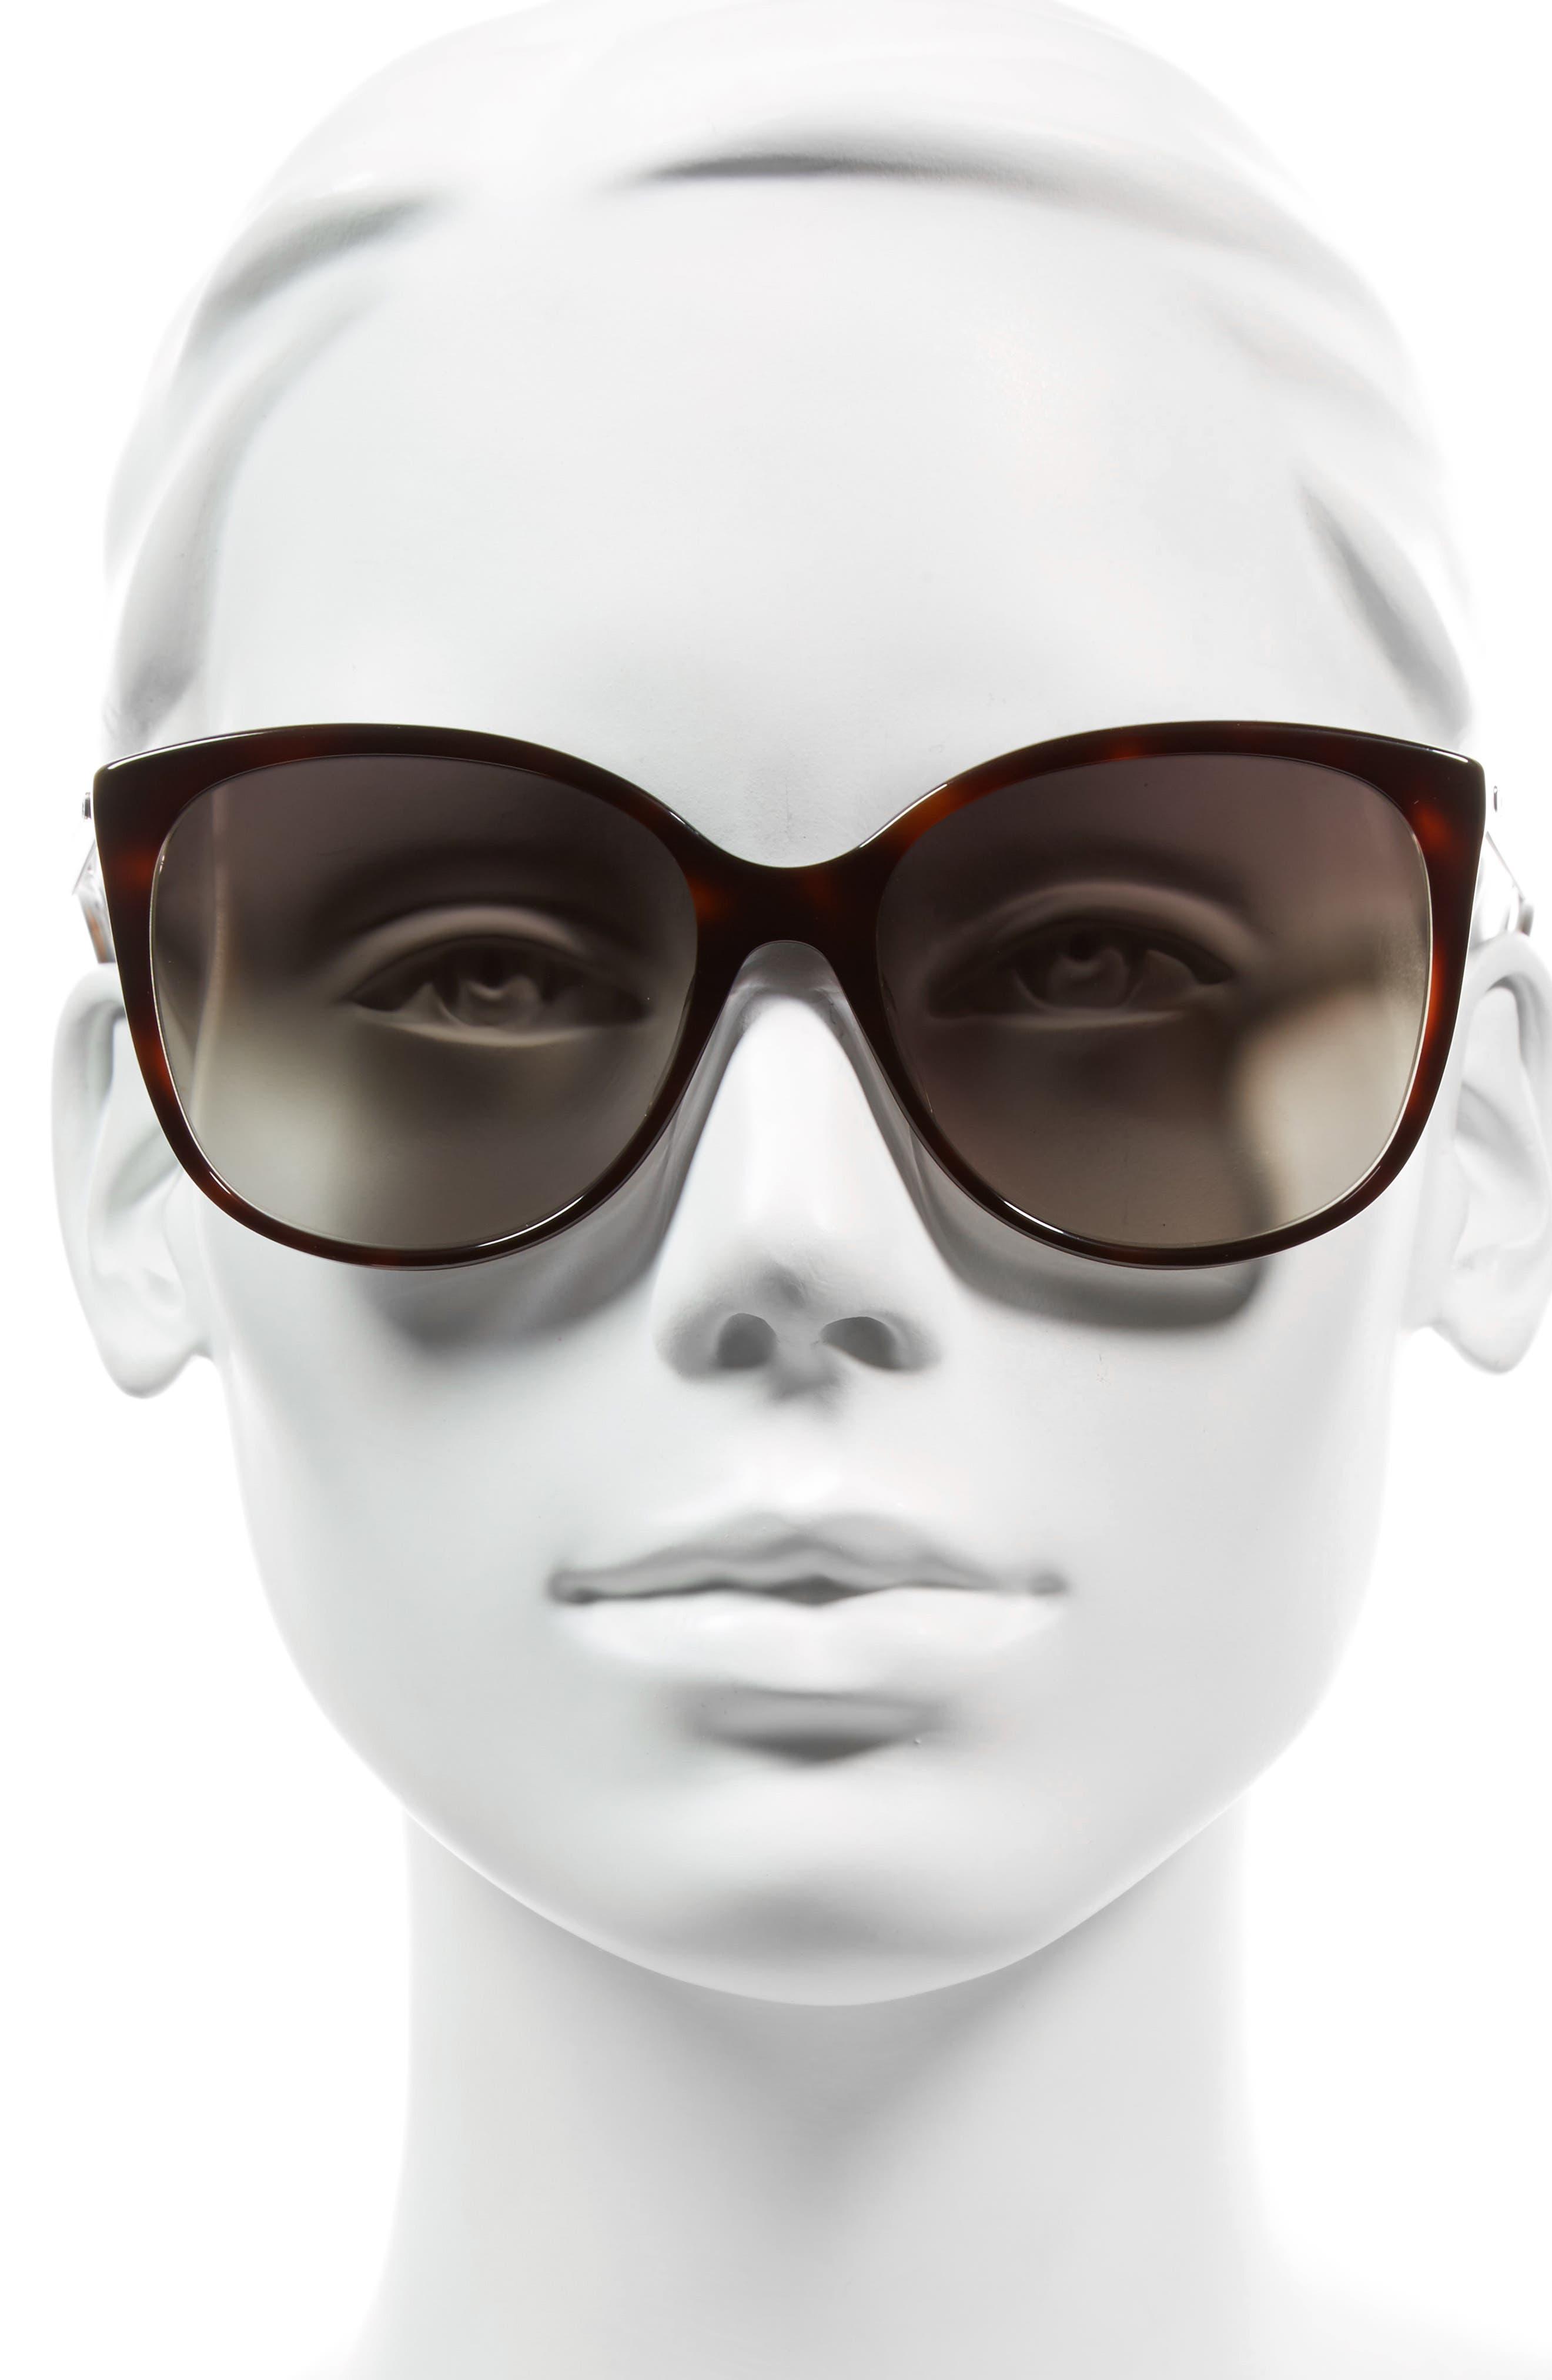 MARC JACOBS, 56mm Gradient Lens Butterfly Sunglasses, Alternate thumbnail 2, color, DARK HAVANA